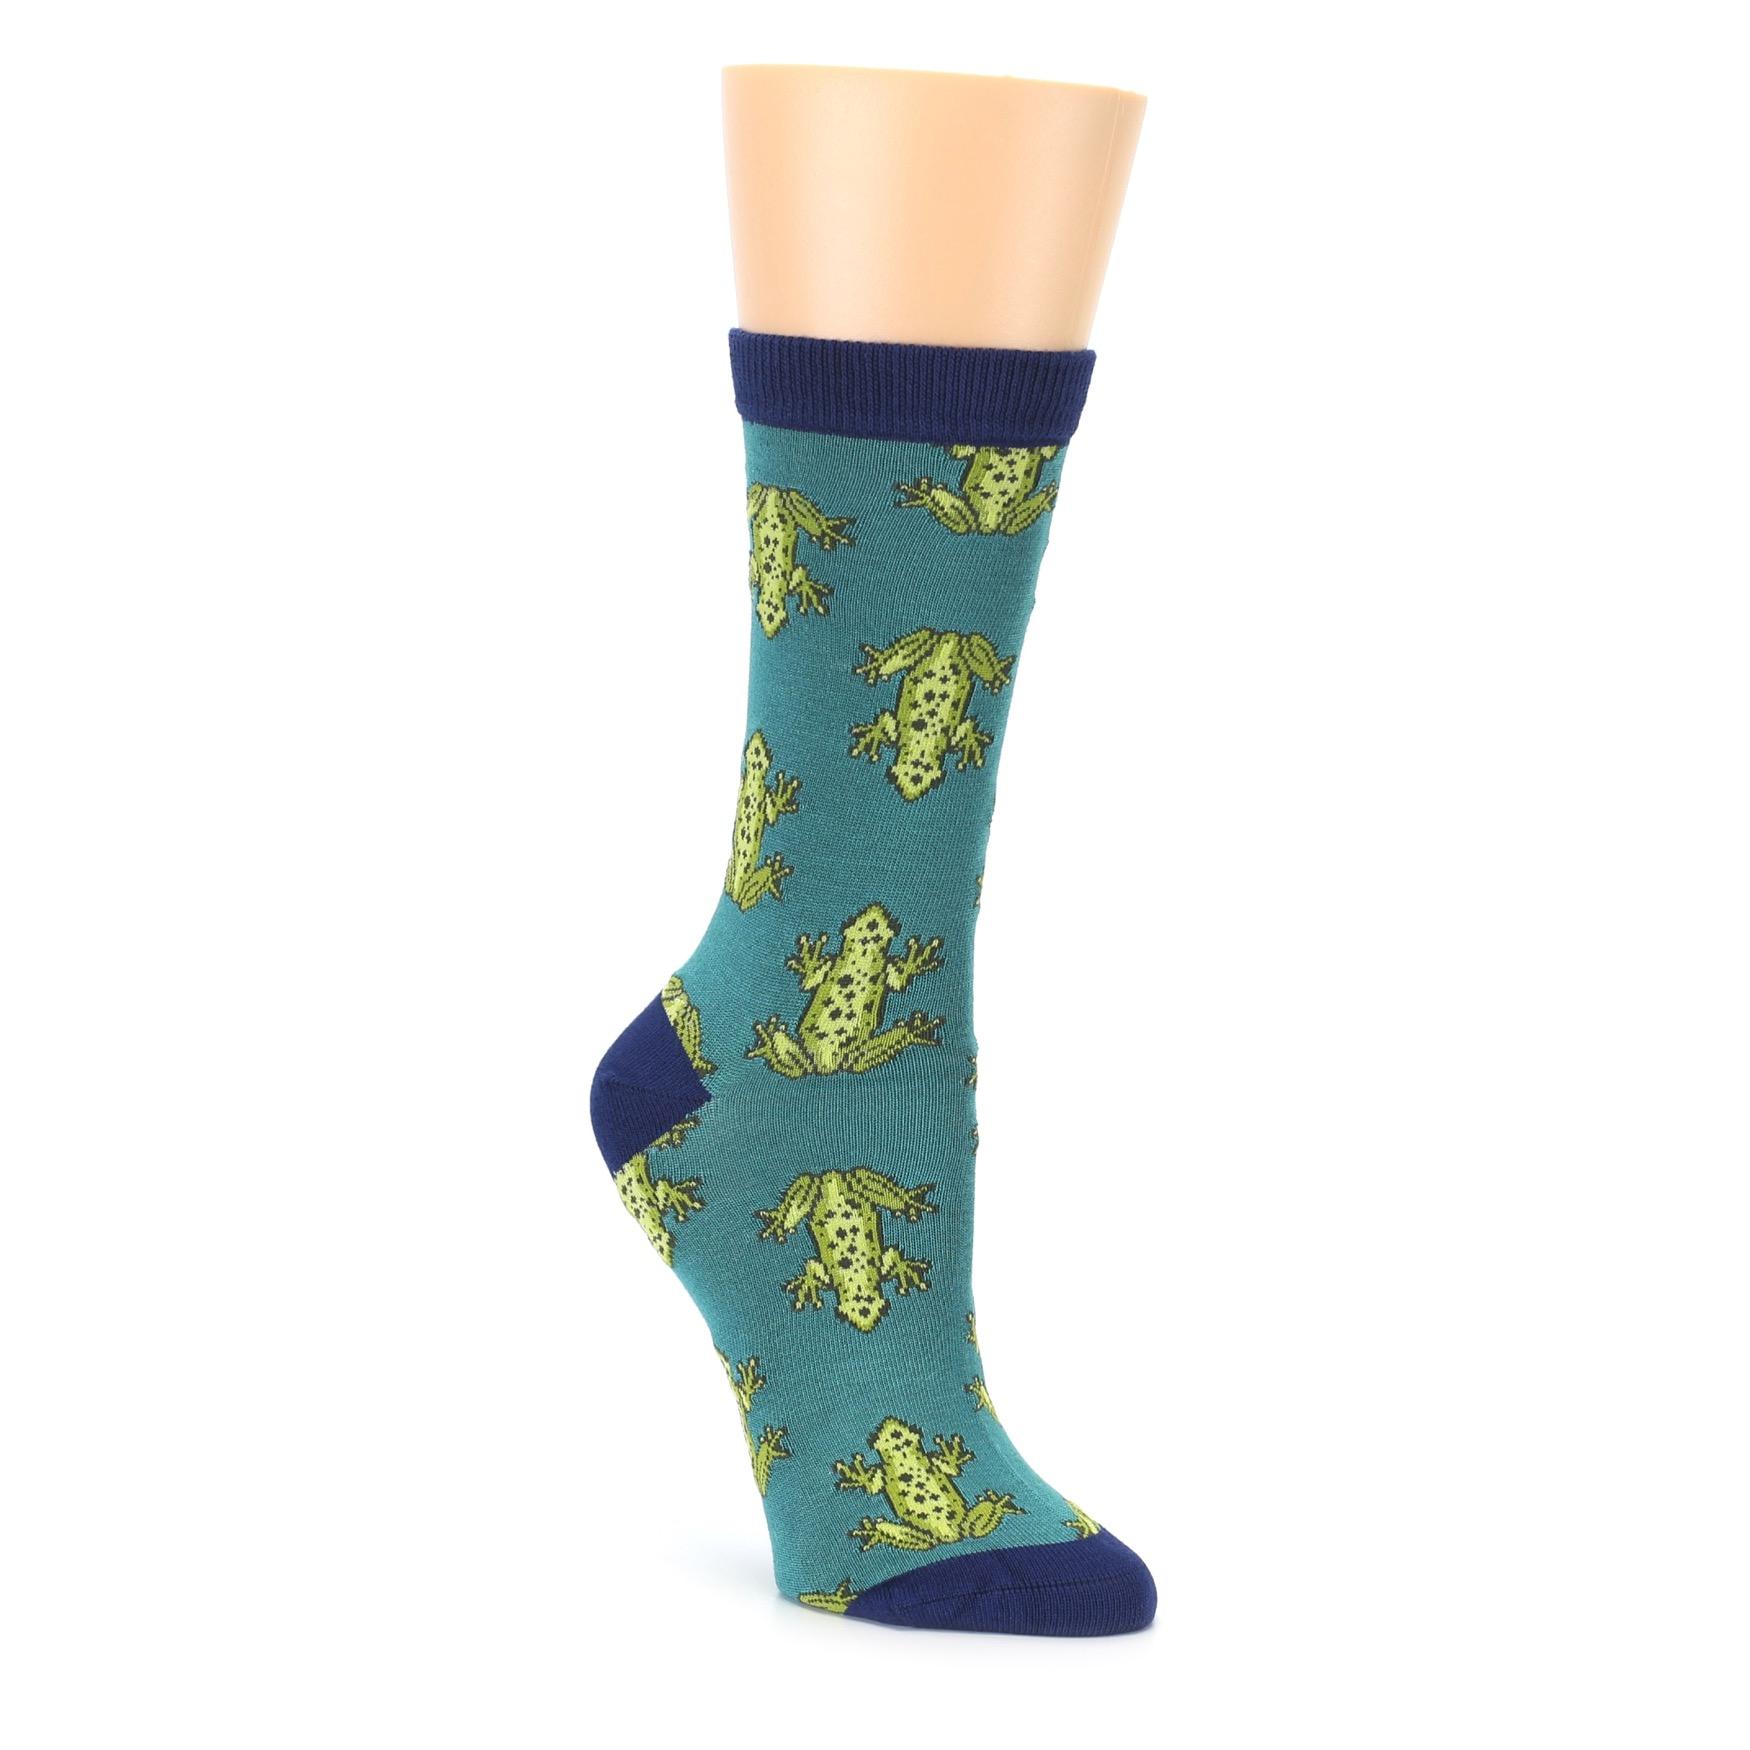 Frog Socks Animal socks.business socks.Dress socks.